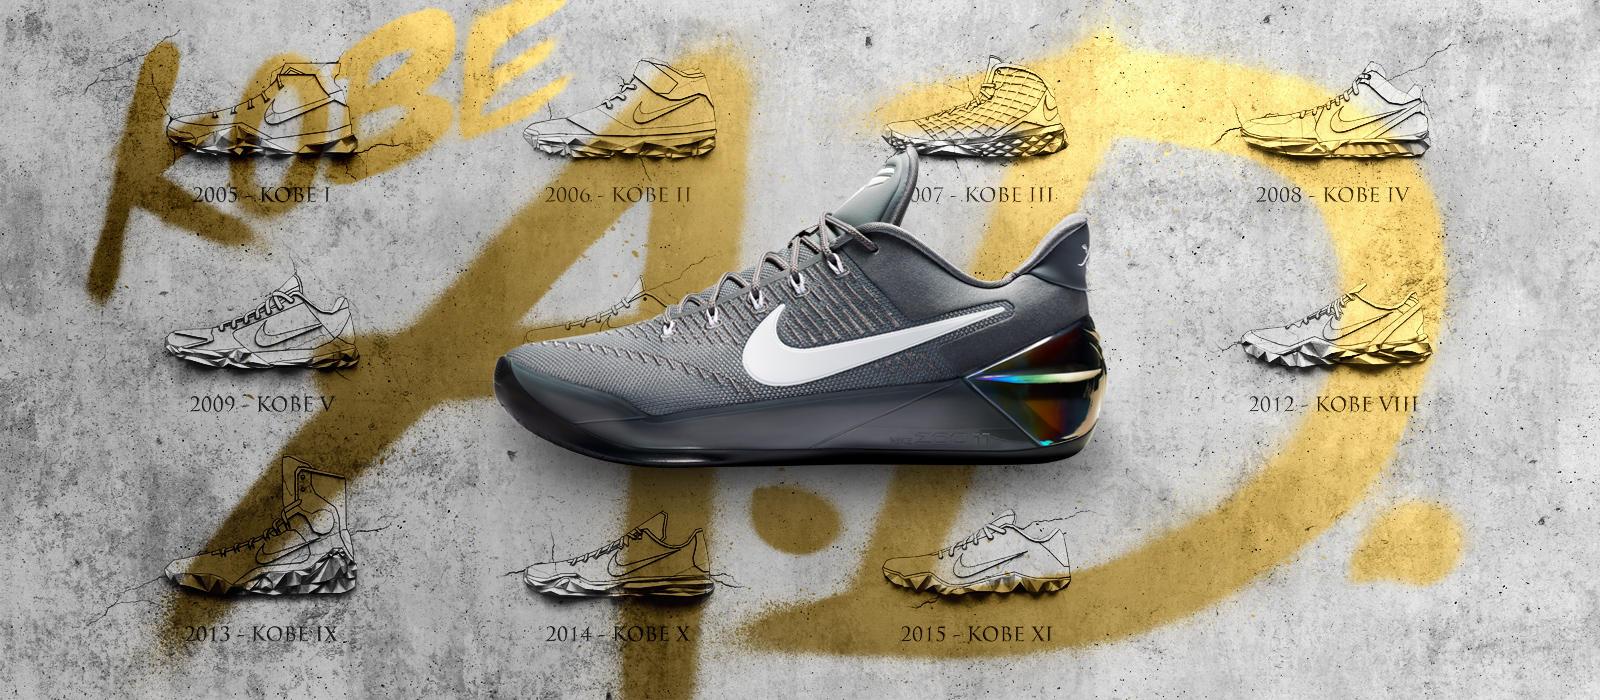 Kobe Bryant présente la Nike Kobe